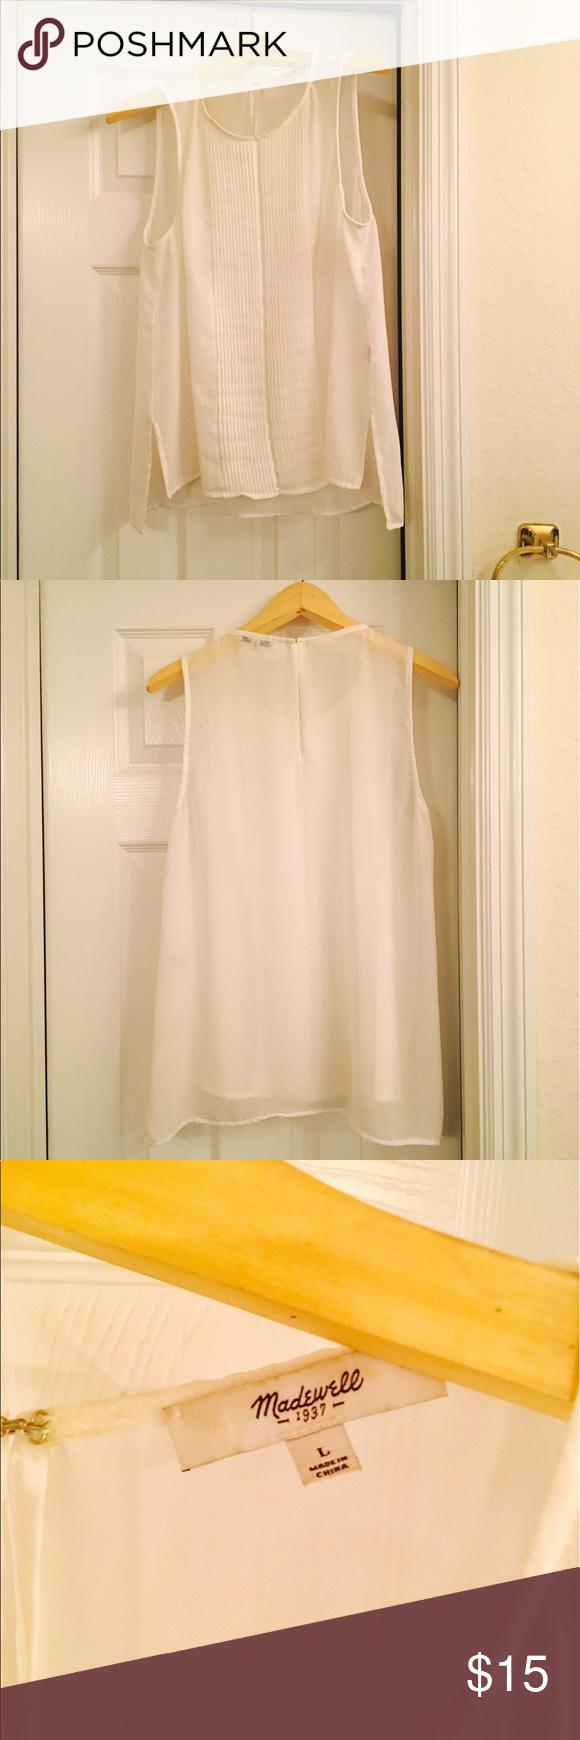 Madewell linen/cotton blend tuxedo top. Sheer classic Madewell. Tiny spot in tuxedo folds. Madewell Tops